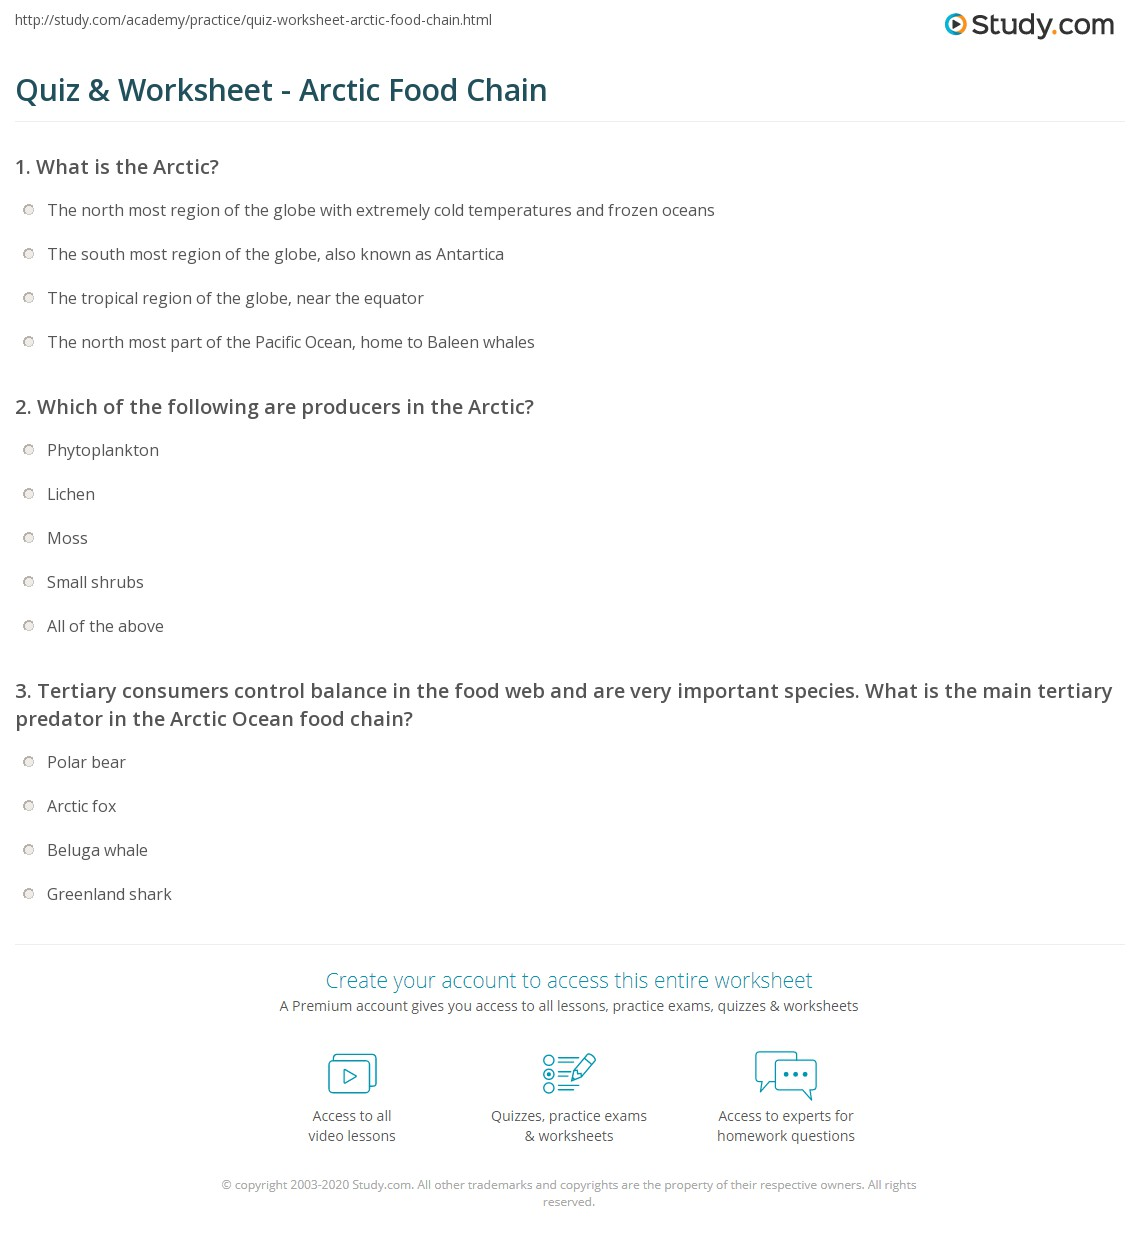 Arctic Ocean Food Web: Quiz & Worksheet - Arctic Food Chain